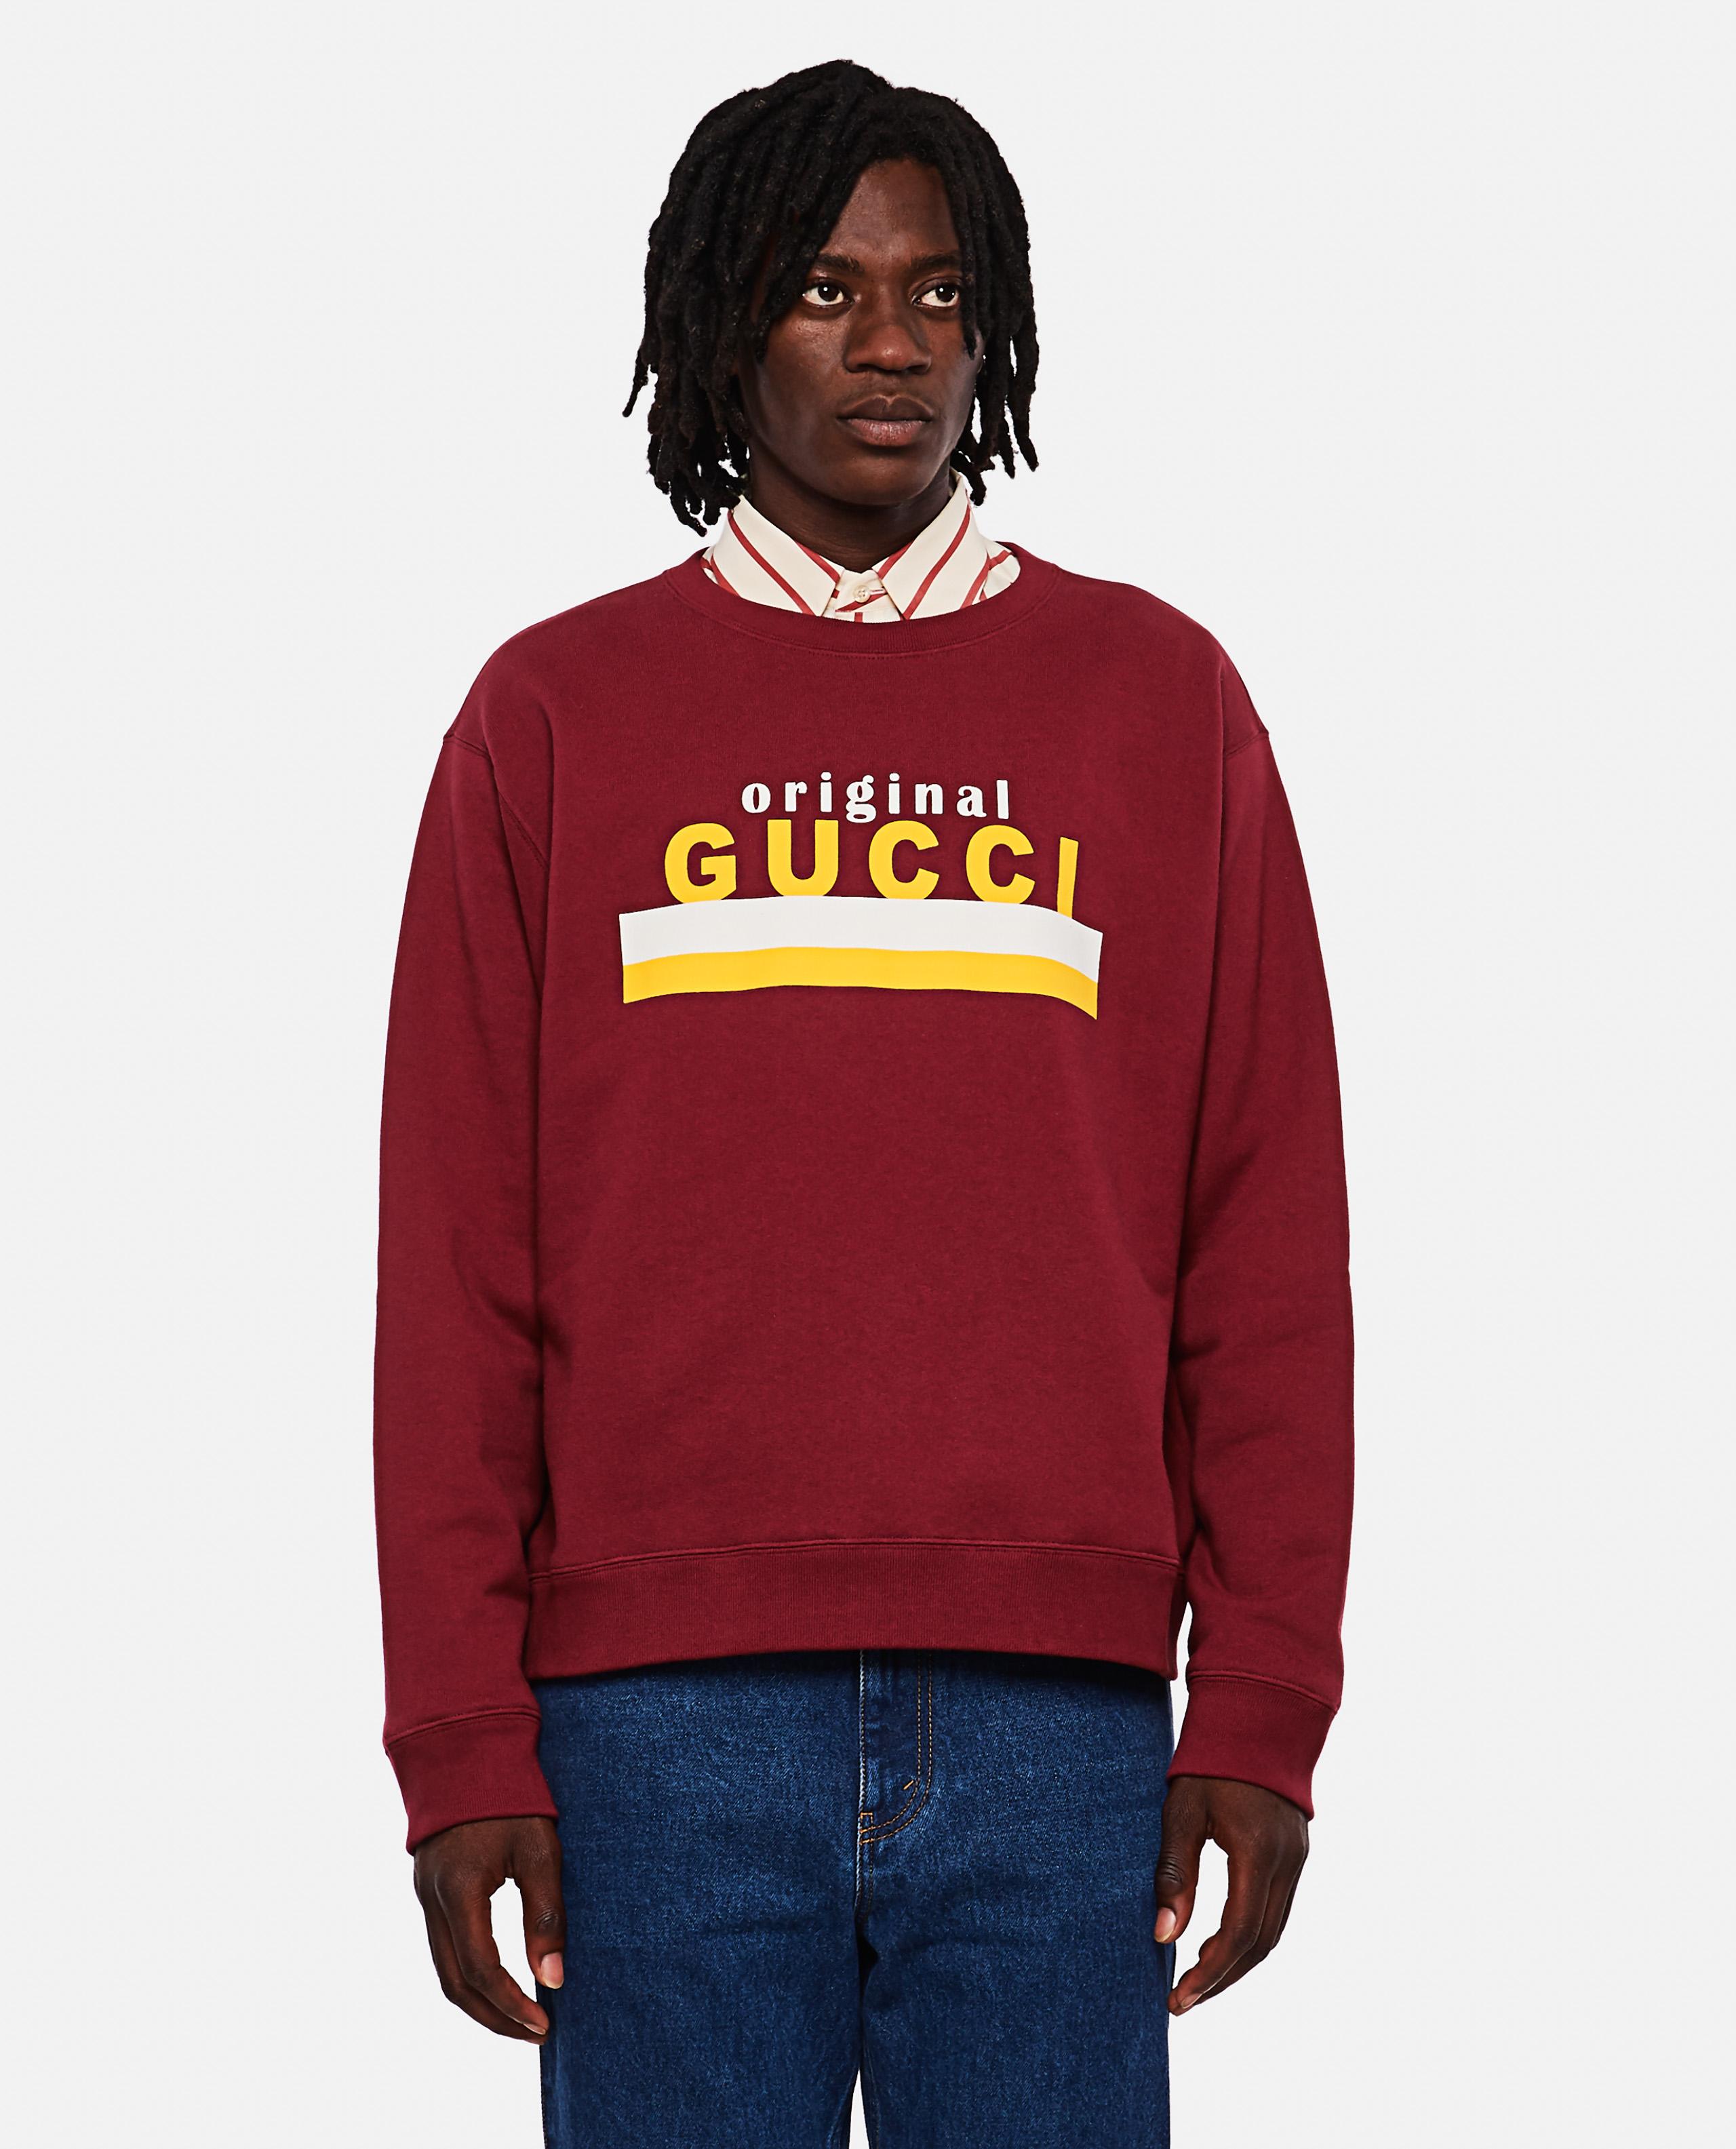 Sweatshirt with 'Original Gucci' print